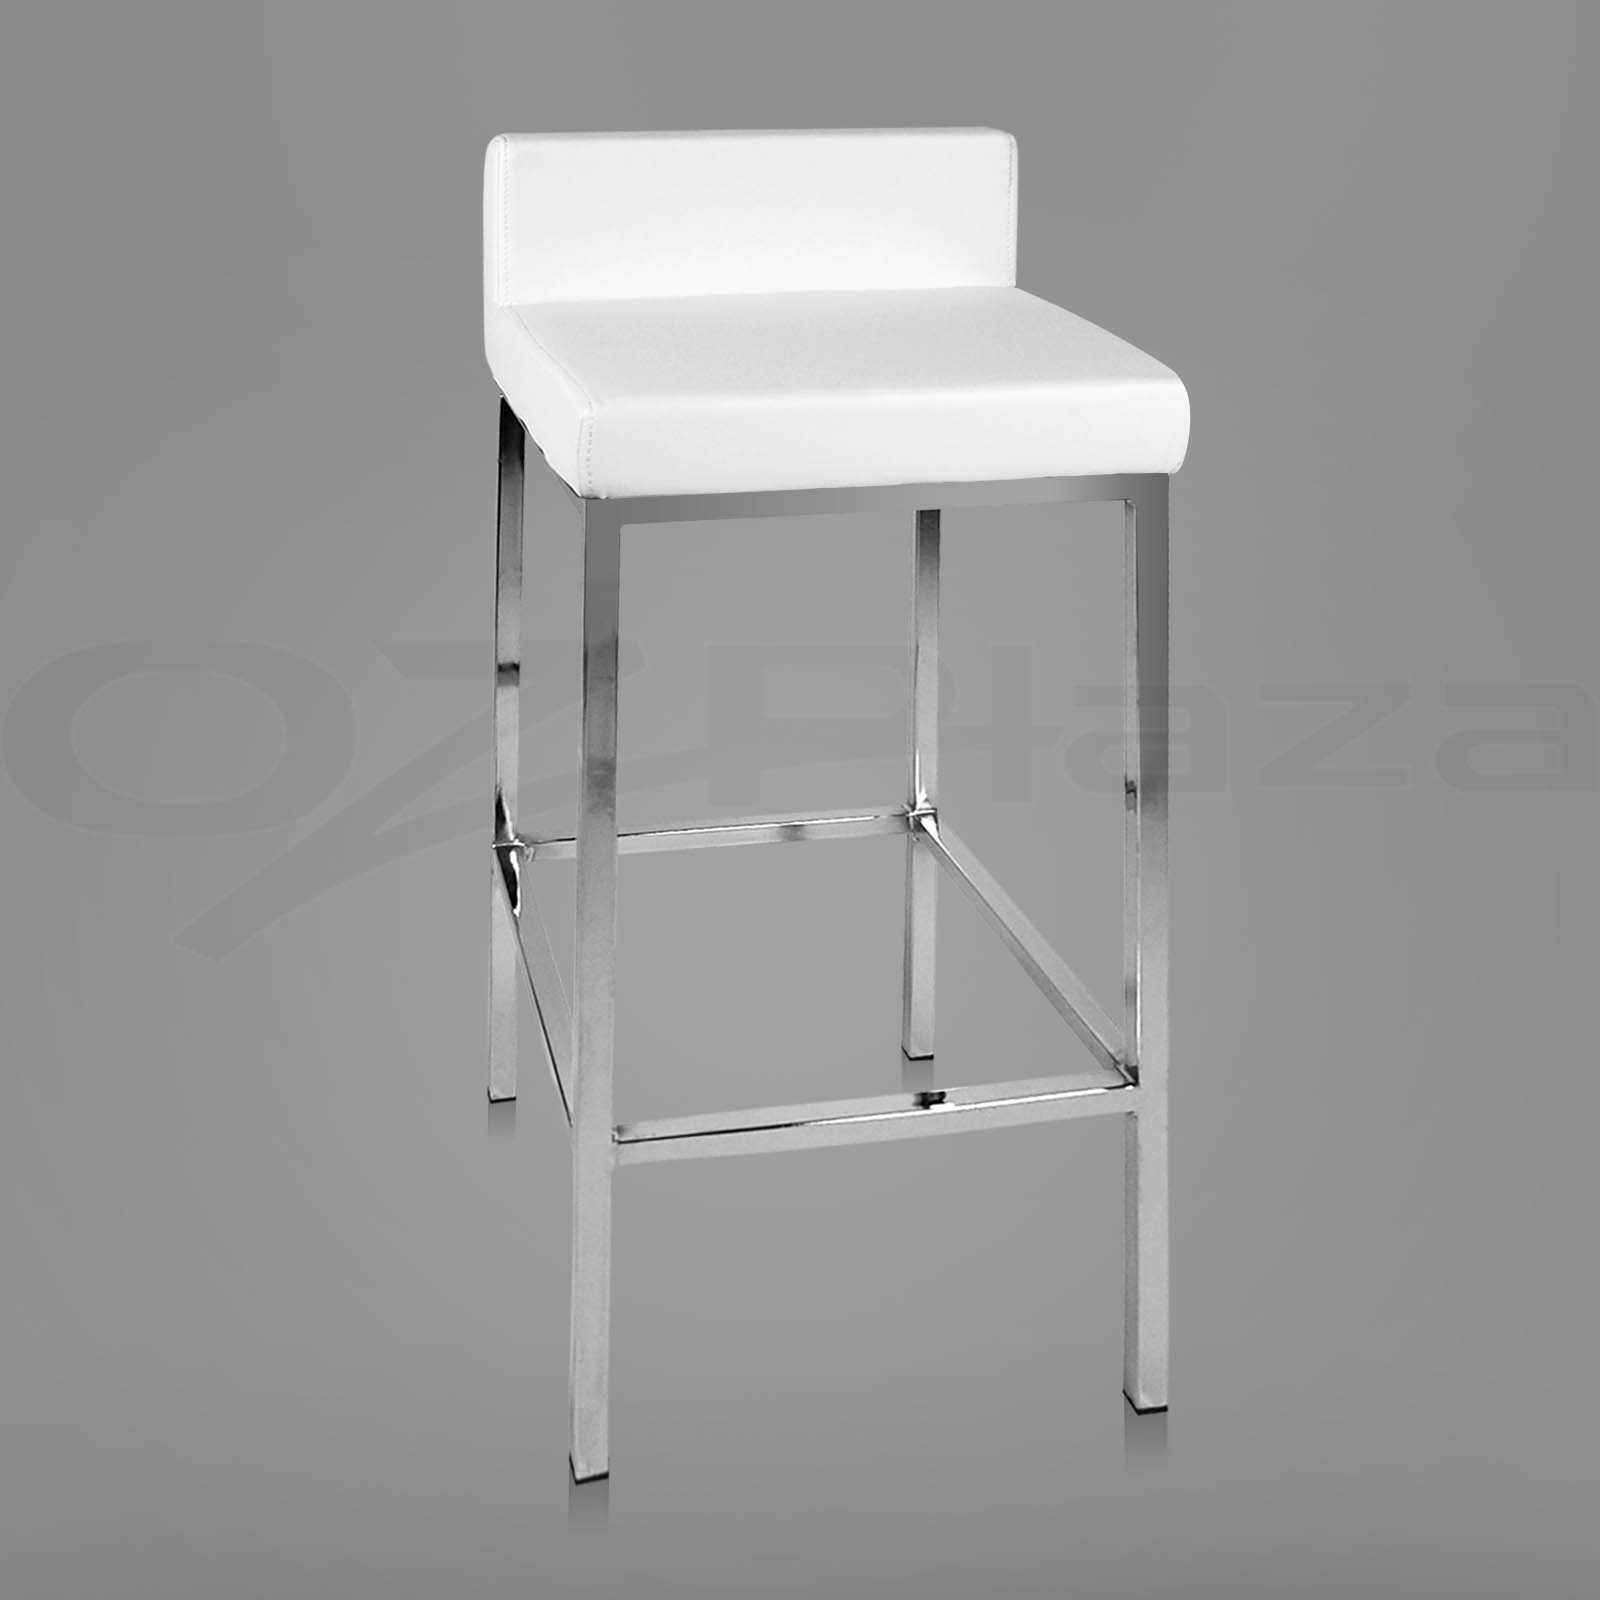 bar stool chair legs director covers target australia 4x pu leather modern kitchen barstool